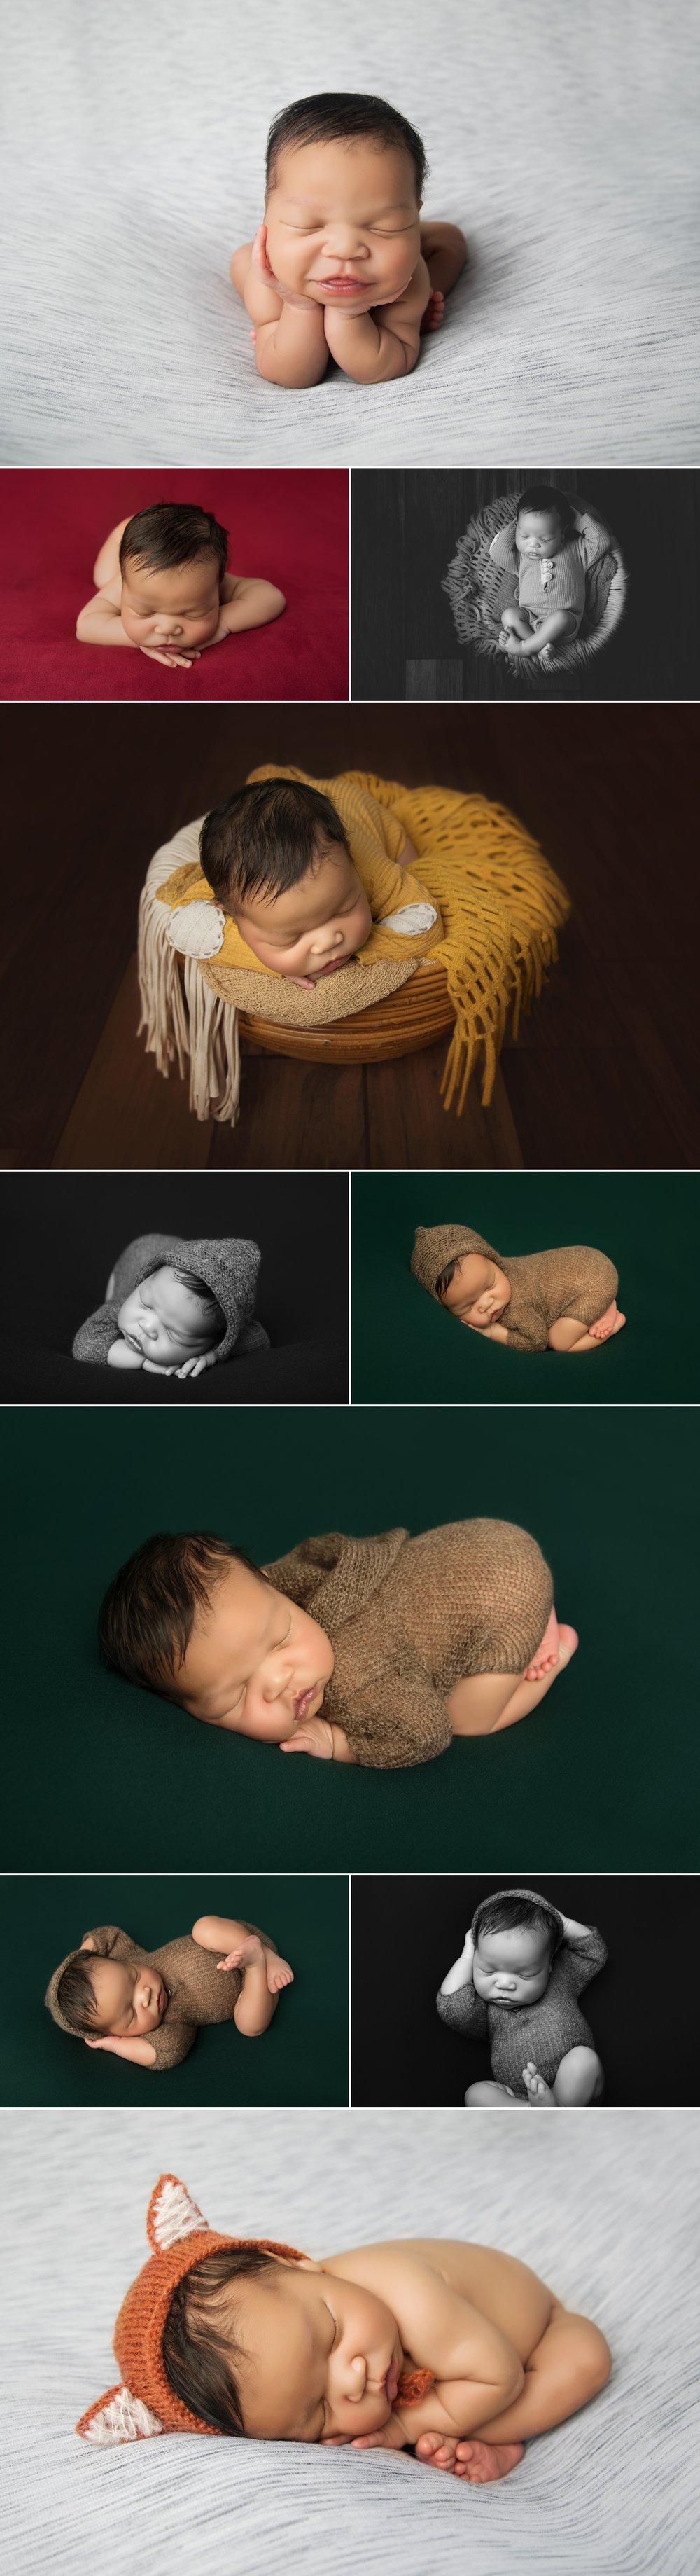 Noah Collage 2.jpg